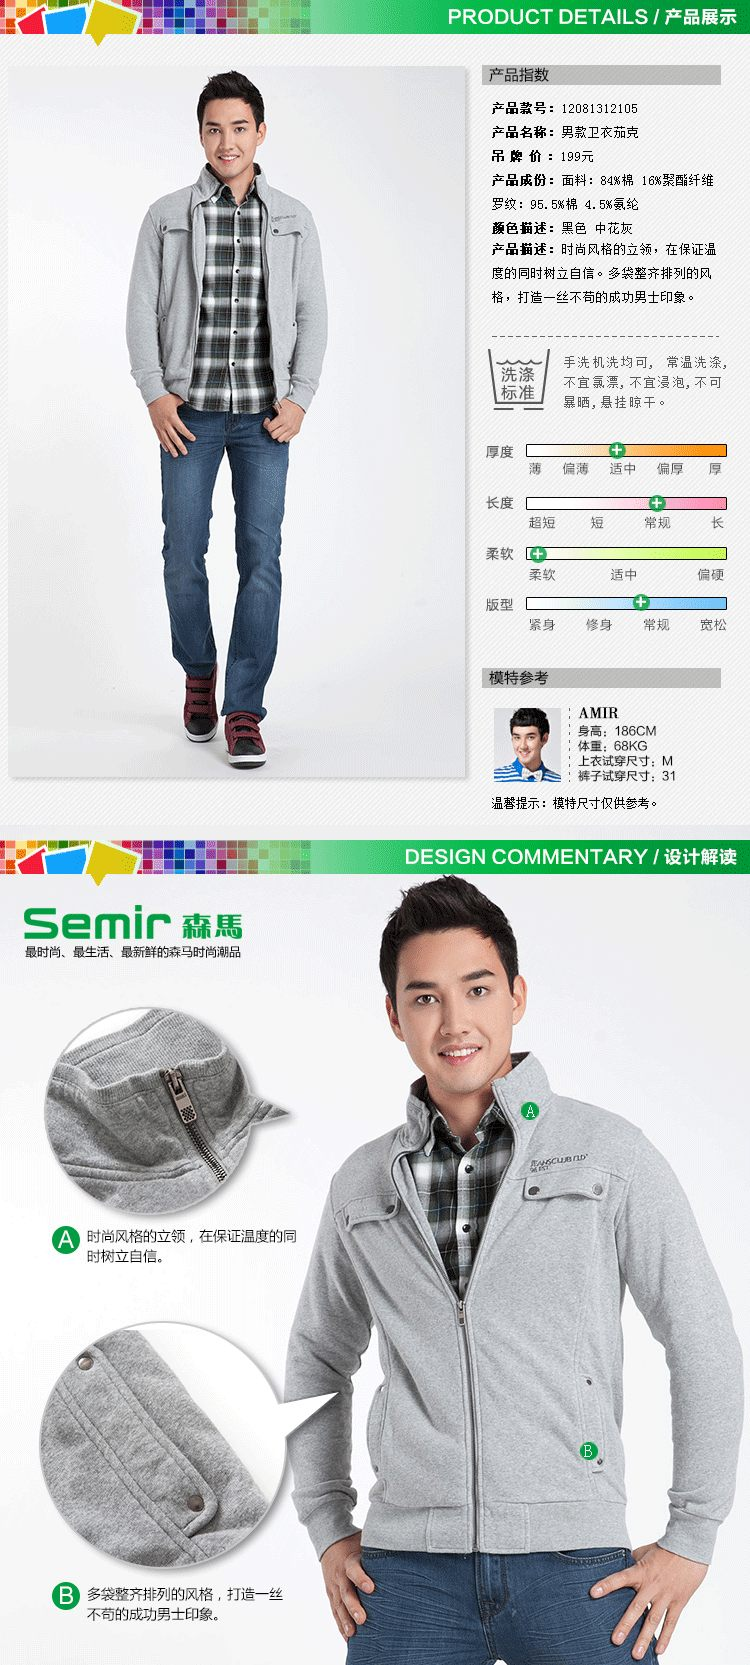 semir 森马服饰-亚马逊中国